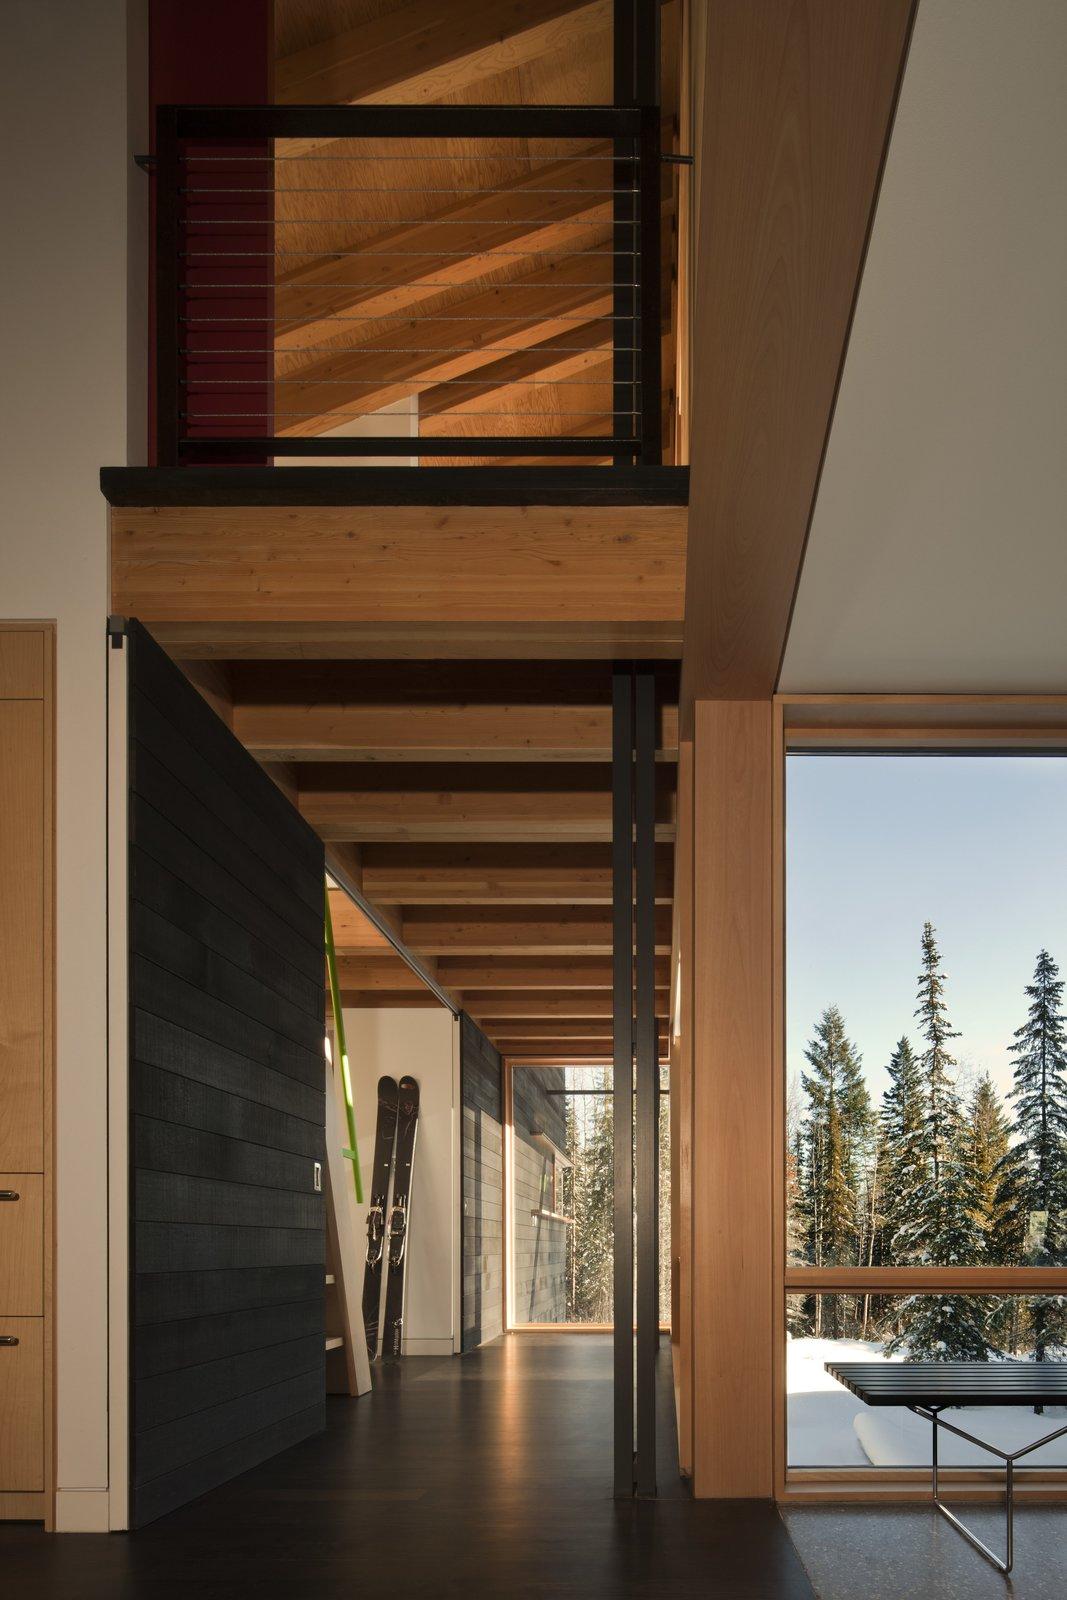 Tagged: Hallway.  Kicking Horse Residence by Bohlin Cywinski Jackson